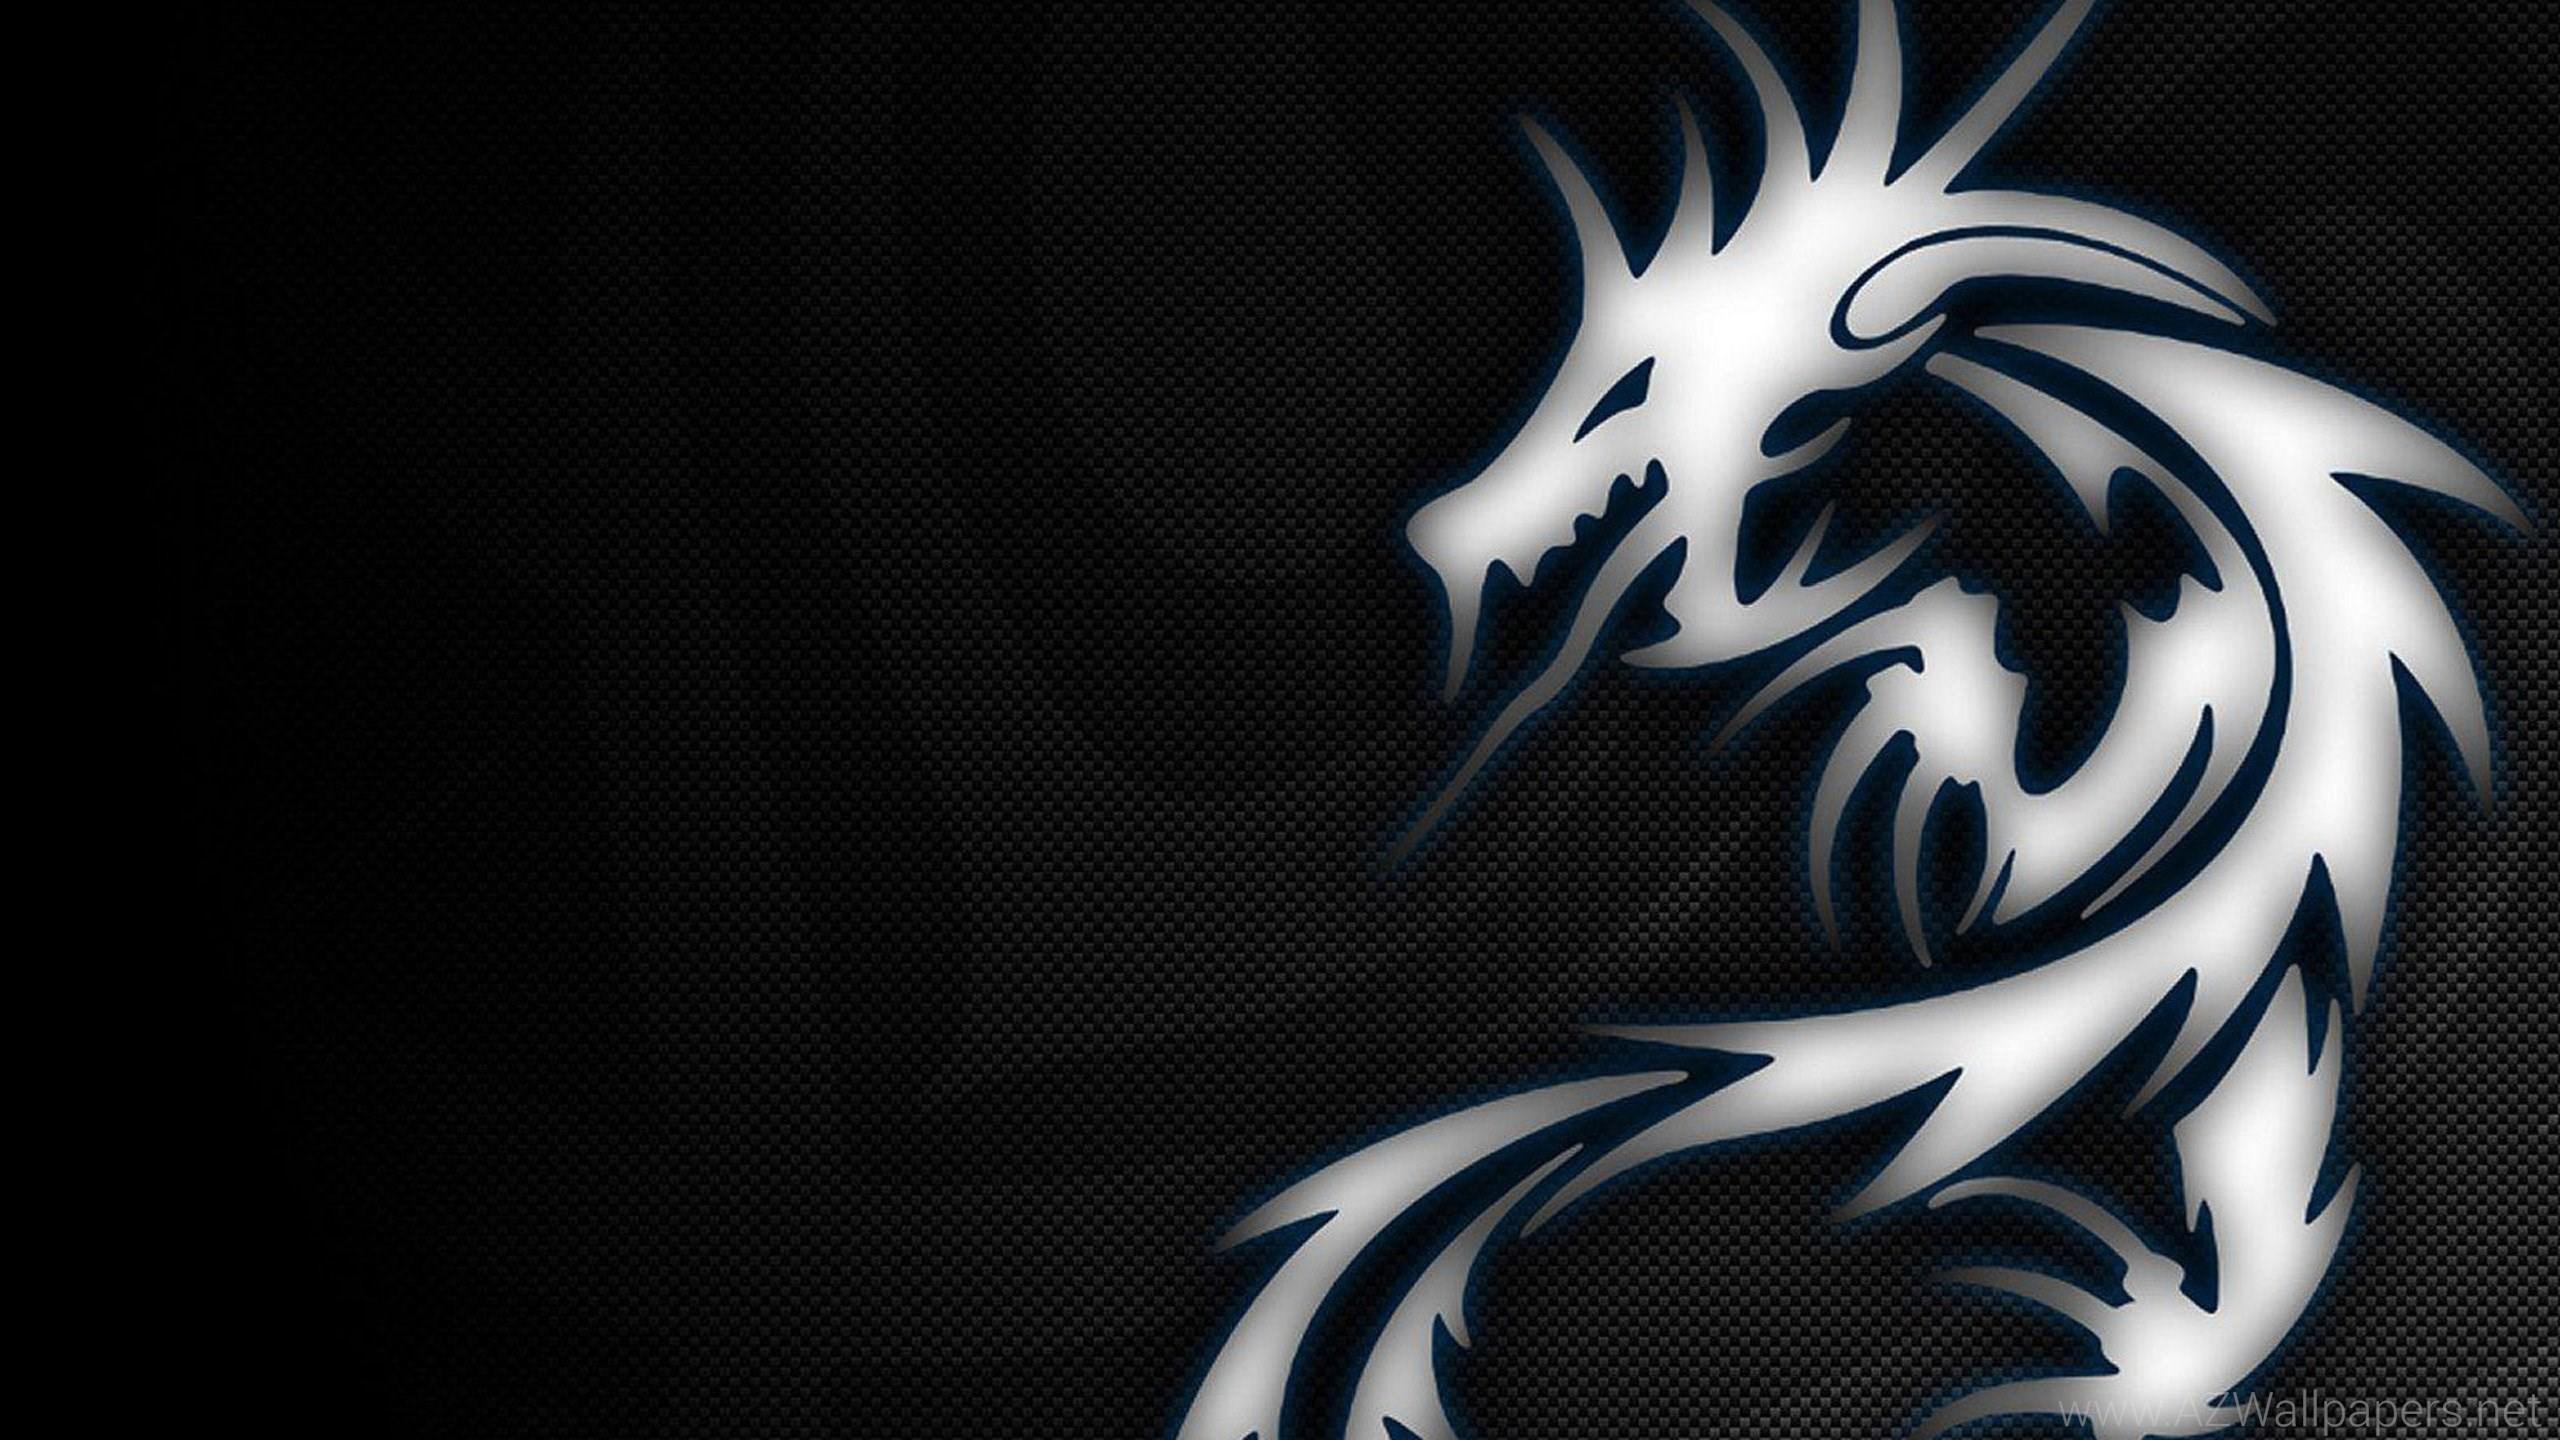 Dragon MSI Logo Wallpaper, HD Desktop Wallpapers